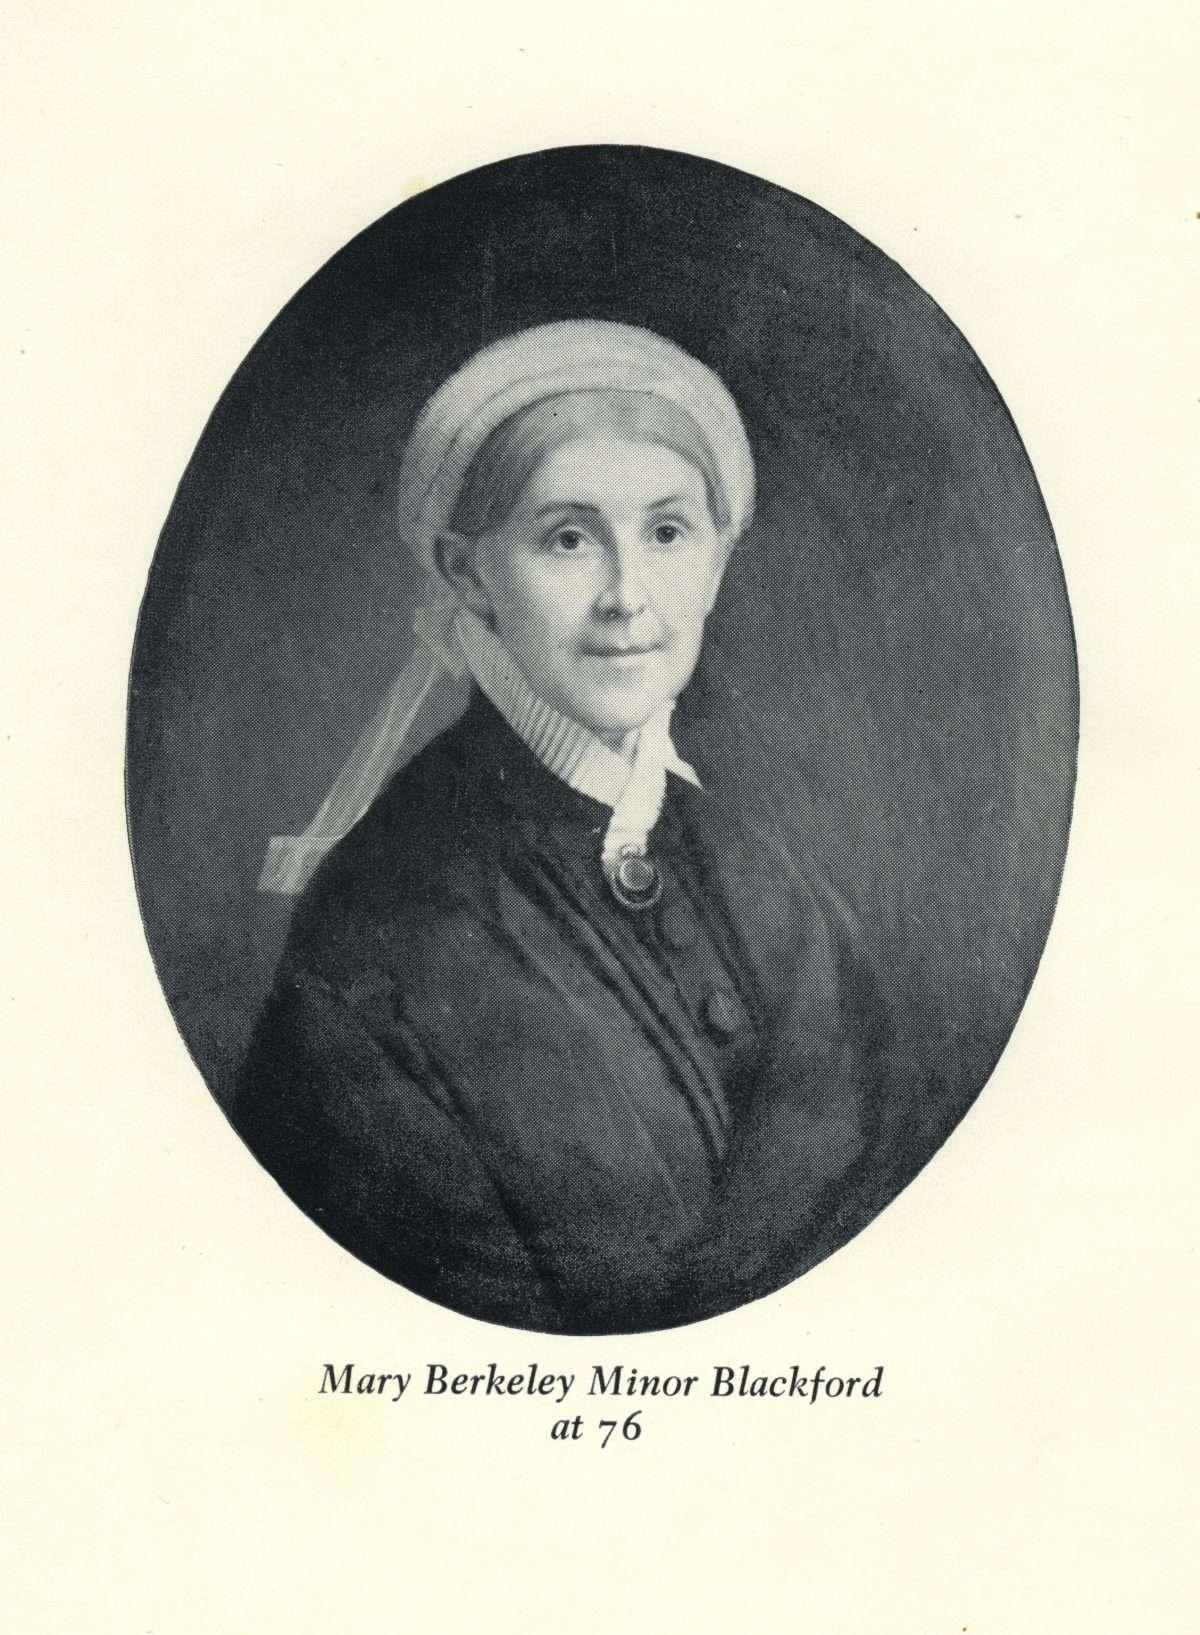 Mary Berkeley Minor Blackford